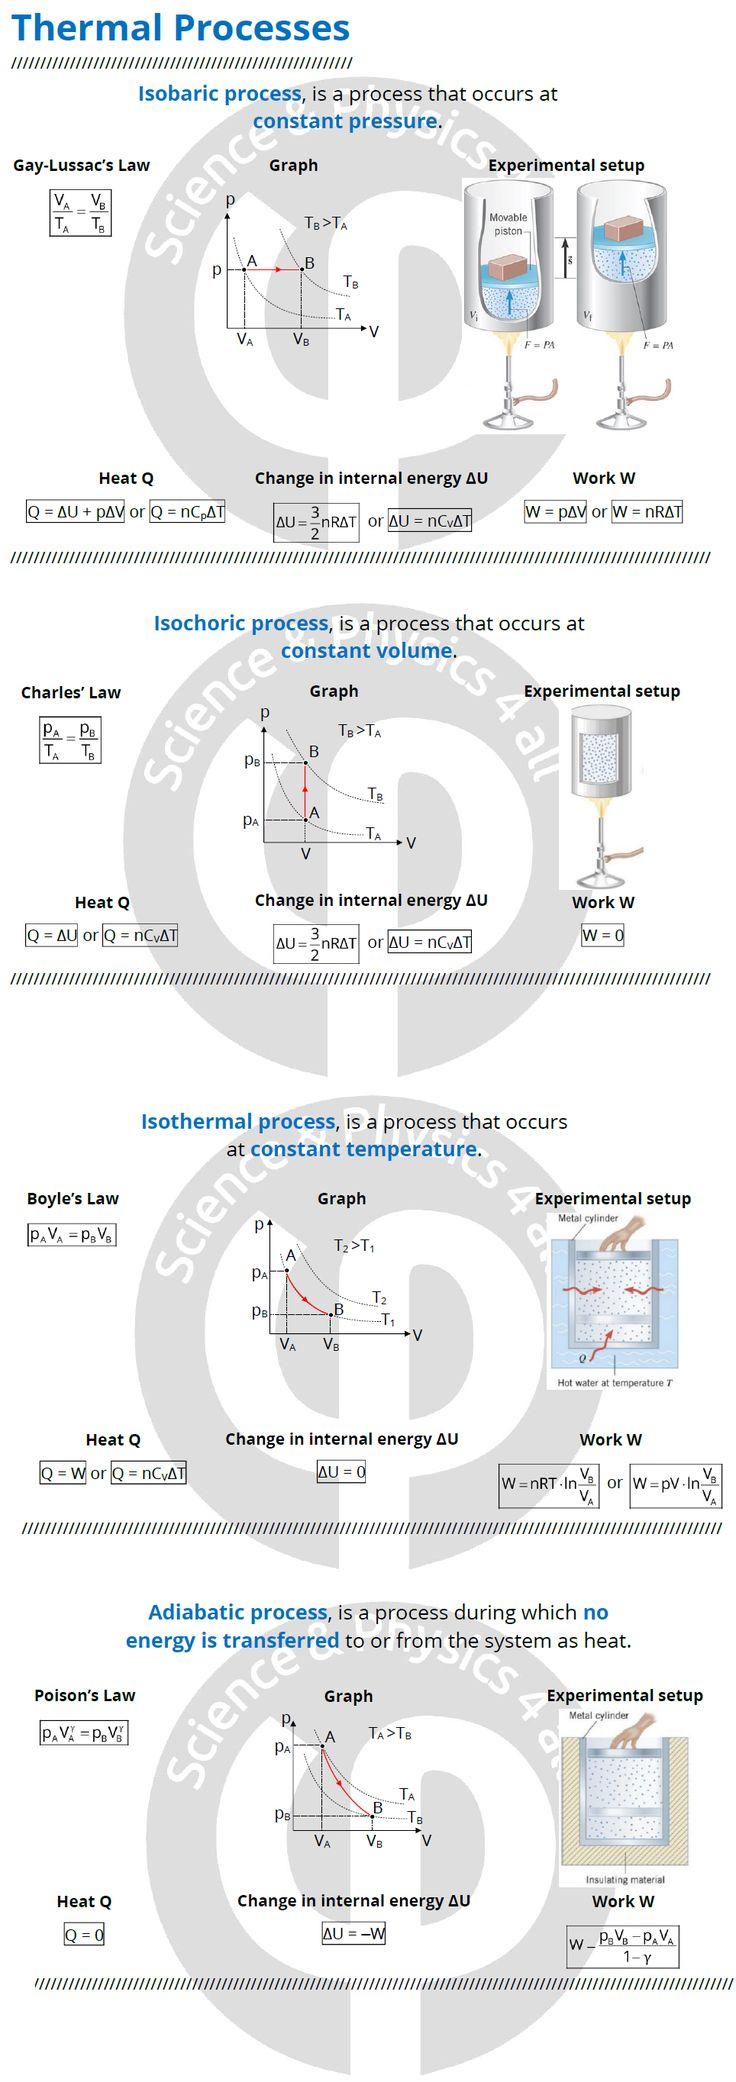 Thermodynamics, thermal processes. Τυπολόγιο μεταβολών των ιδανικών αερίων. Θερμοδυναμική, κινητική θεωρία αερίων.